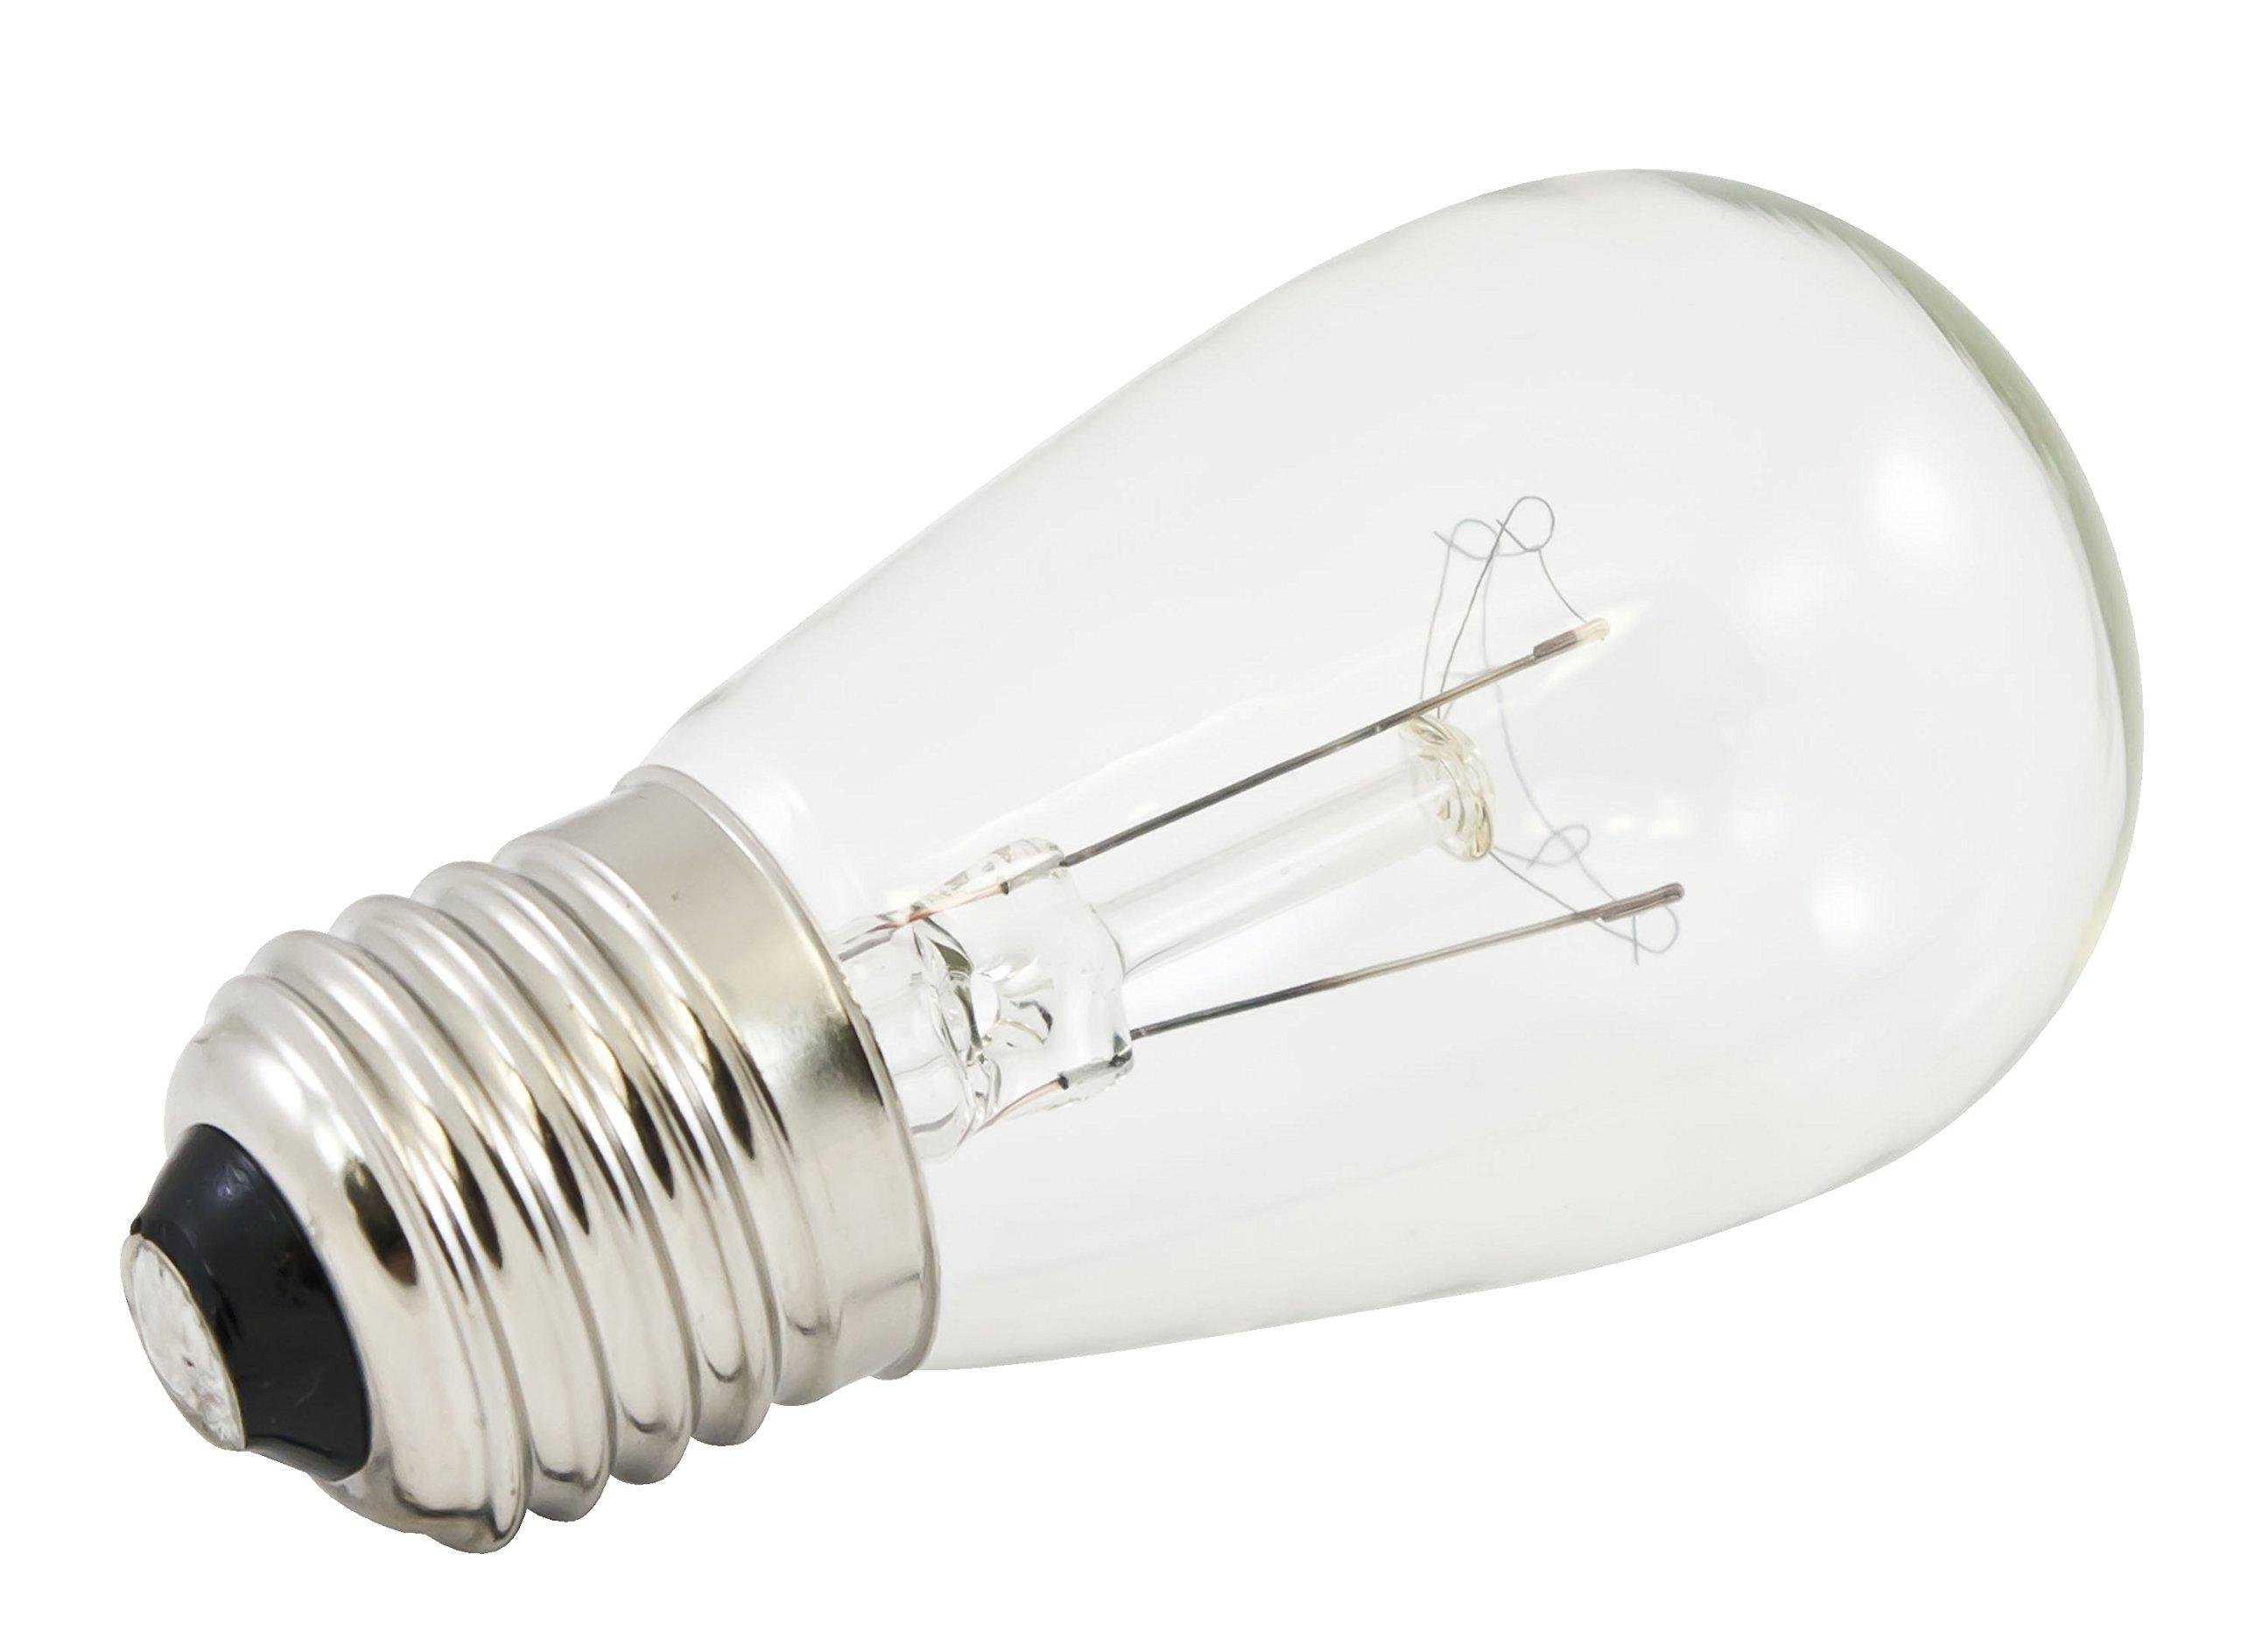 American Lighting B11S14-CL Incandescent S14 11-watt Medium Base Bulbs for LS-M-24 and LS-MS-24 Pavilion Light String Kits, Dark Bronze/Clear, 25-Pack